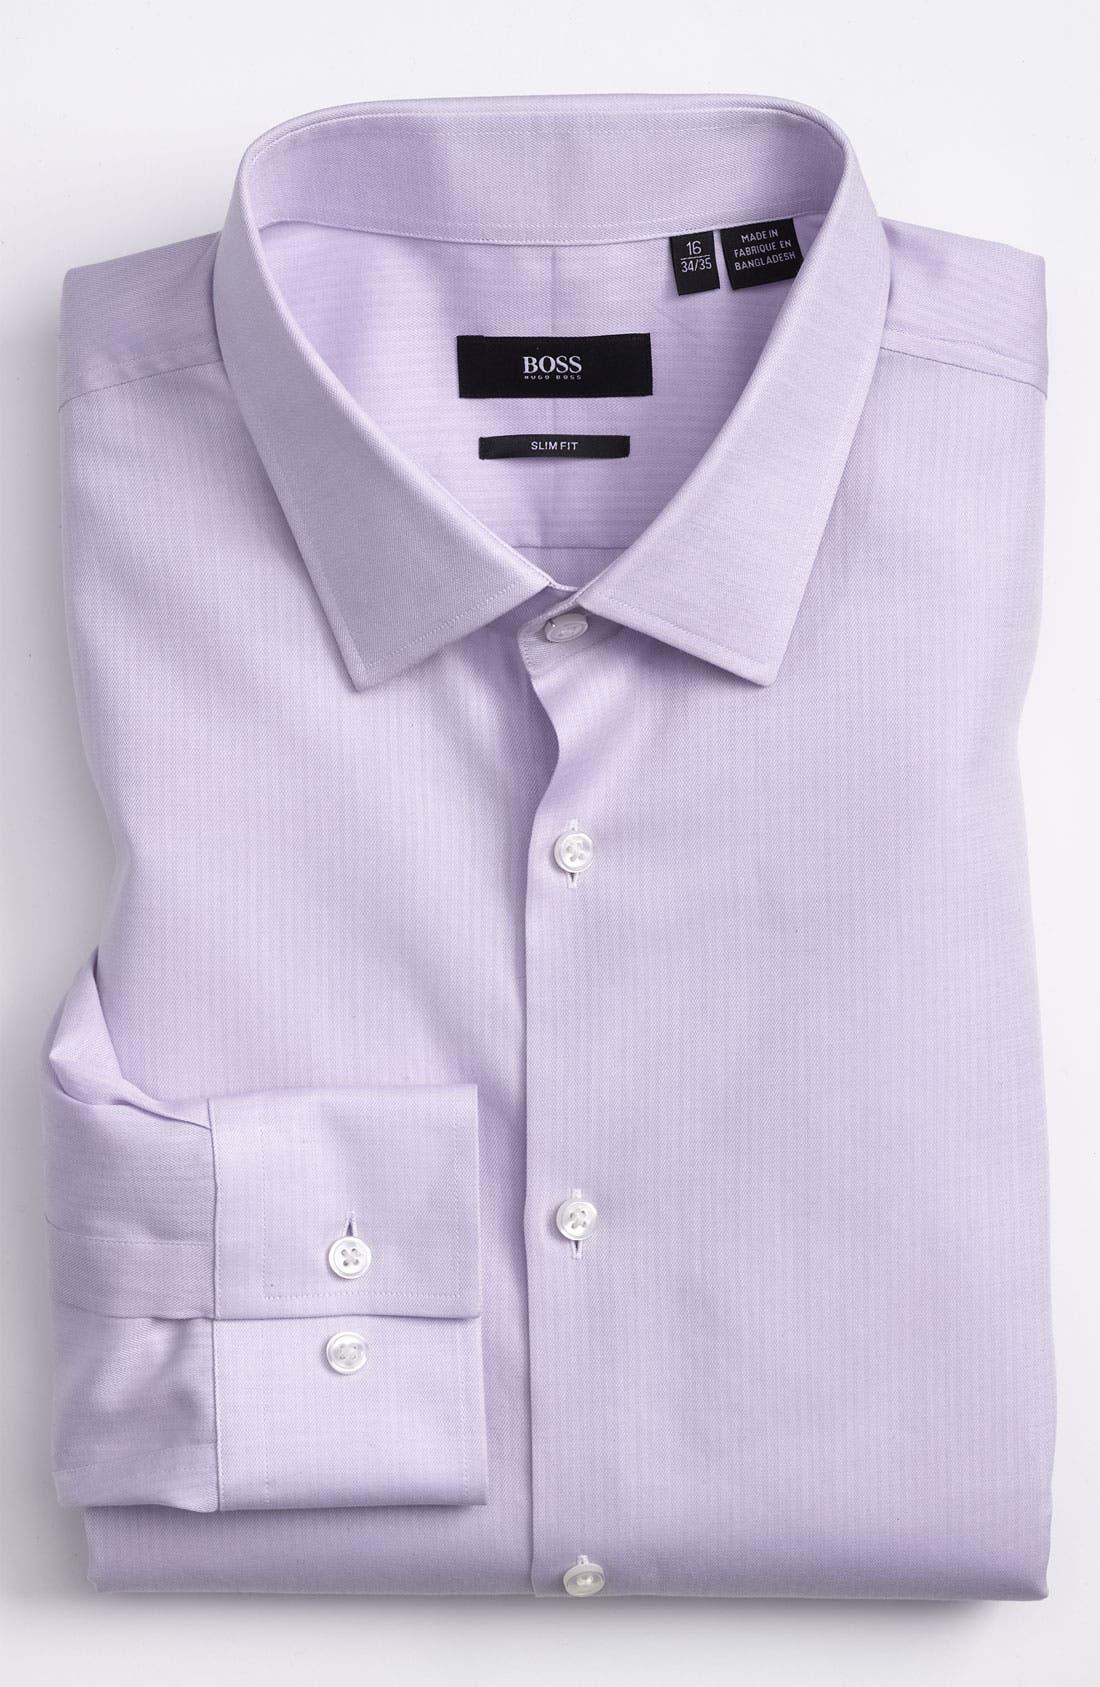 Main Image - BOSS 'Jenno' Slim Fit Herringbone Dress Shirt